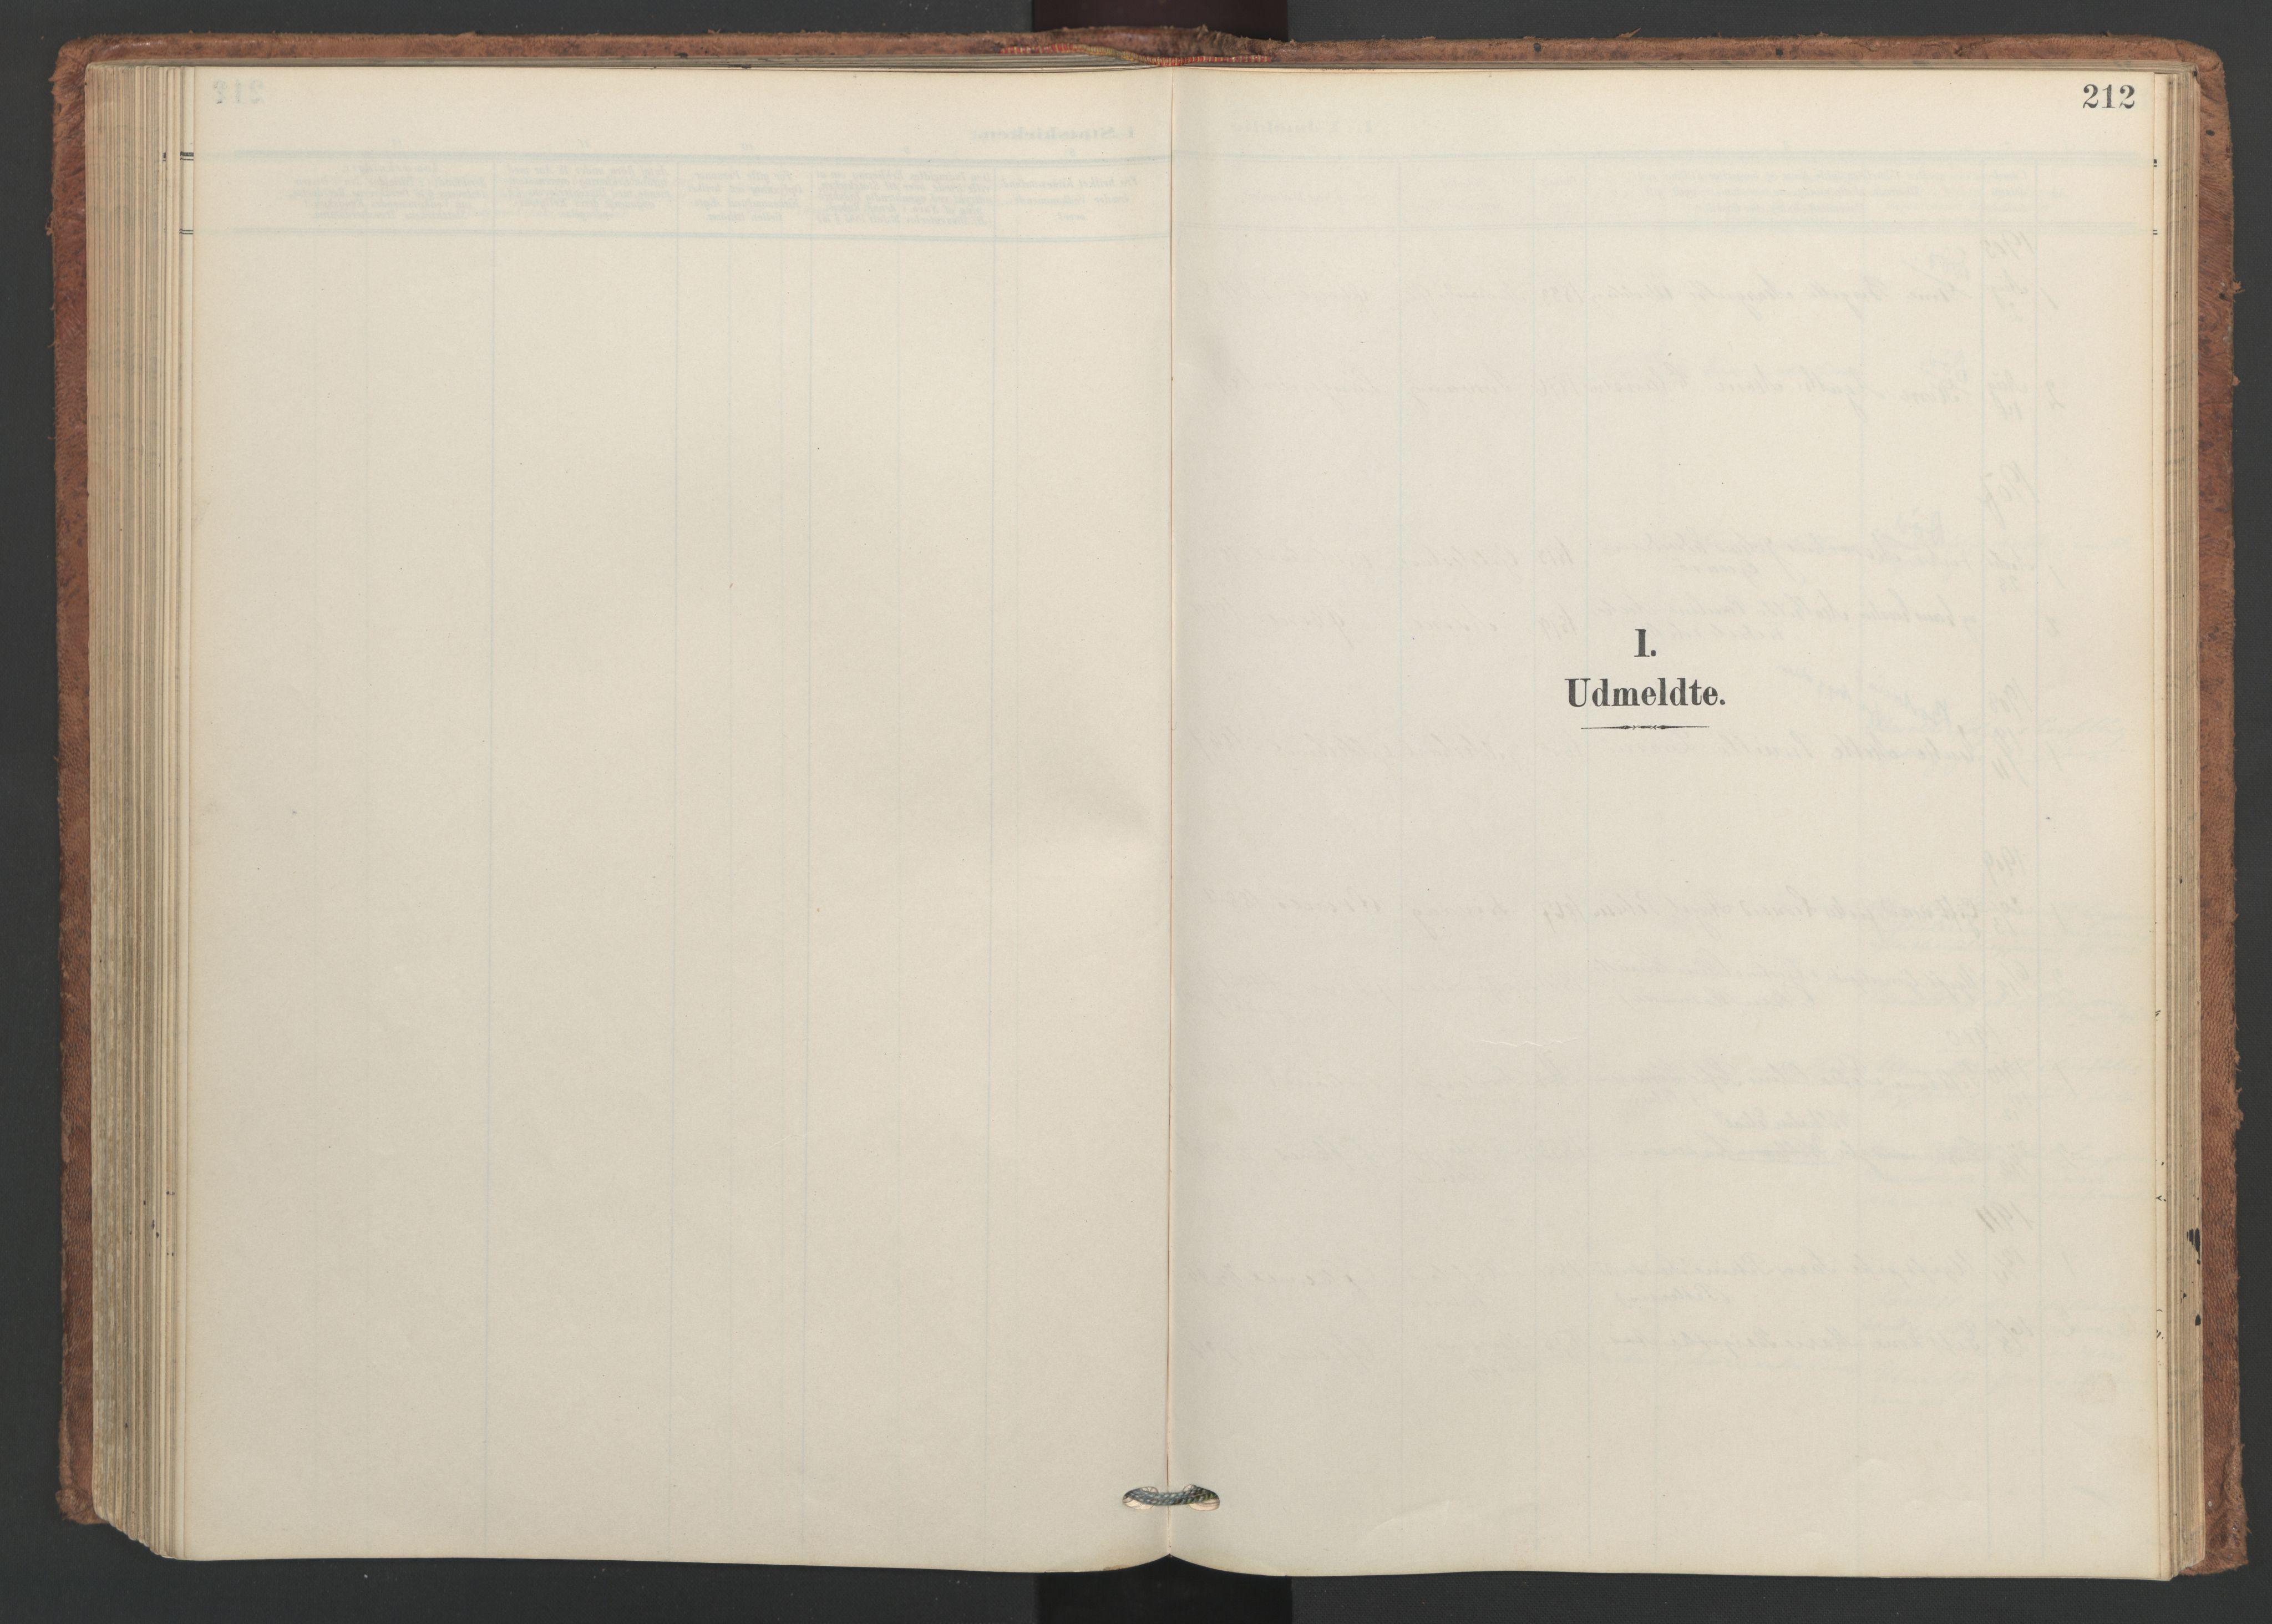 SAT, Ministerialprotokoller, klokkerbøker og fødselsregistre - Nordland, 893/L1339: Ministerialbok nr. 893A11, 1904-1914, s. 212